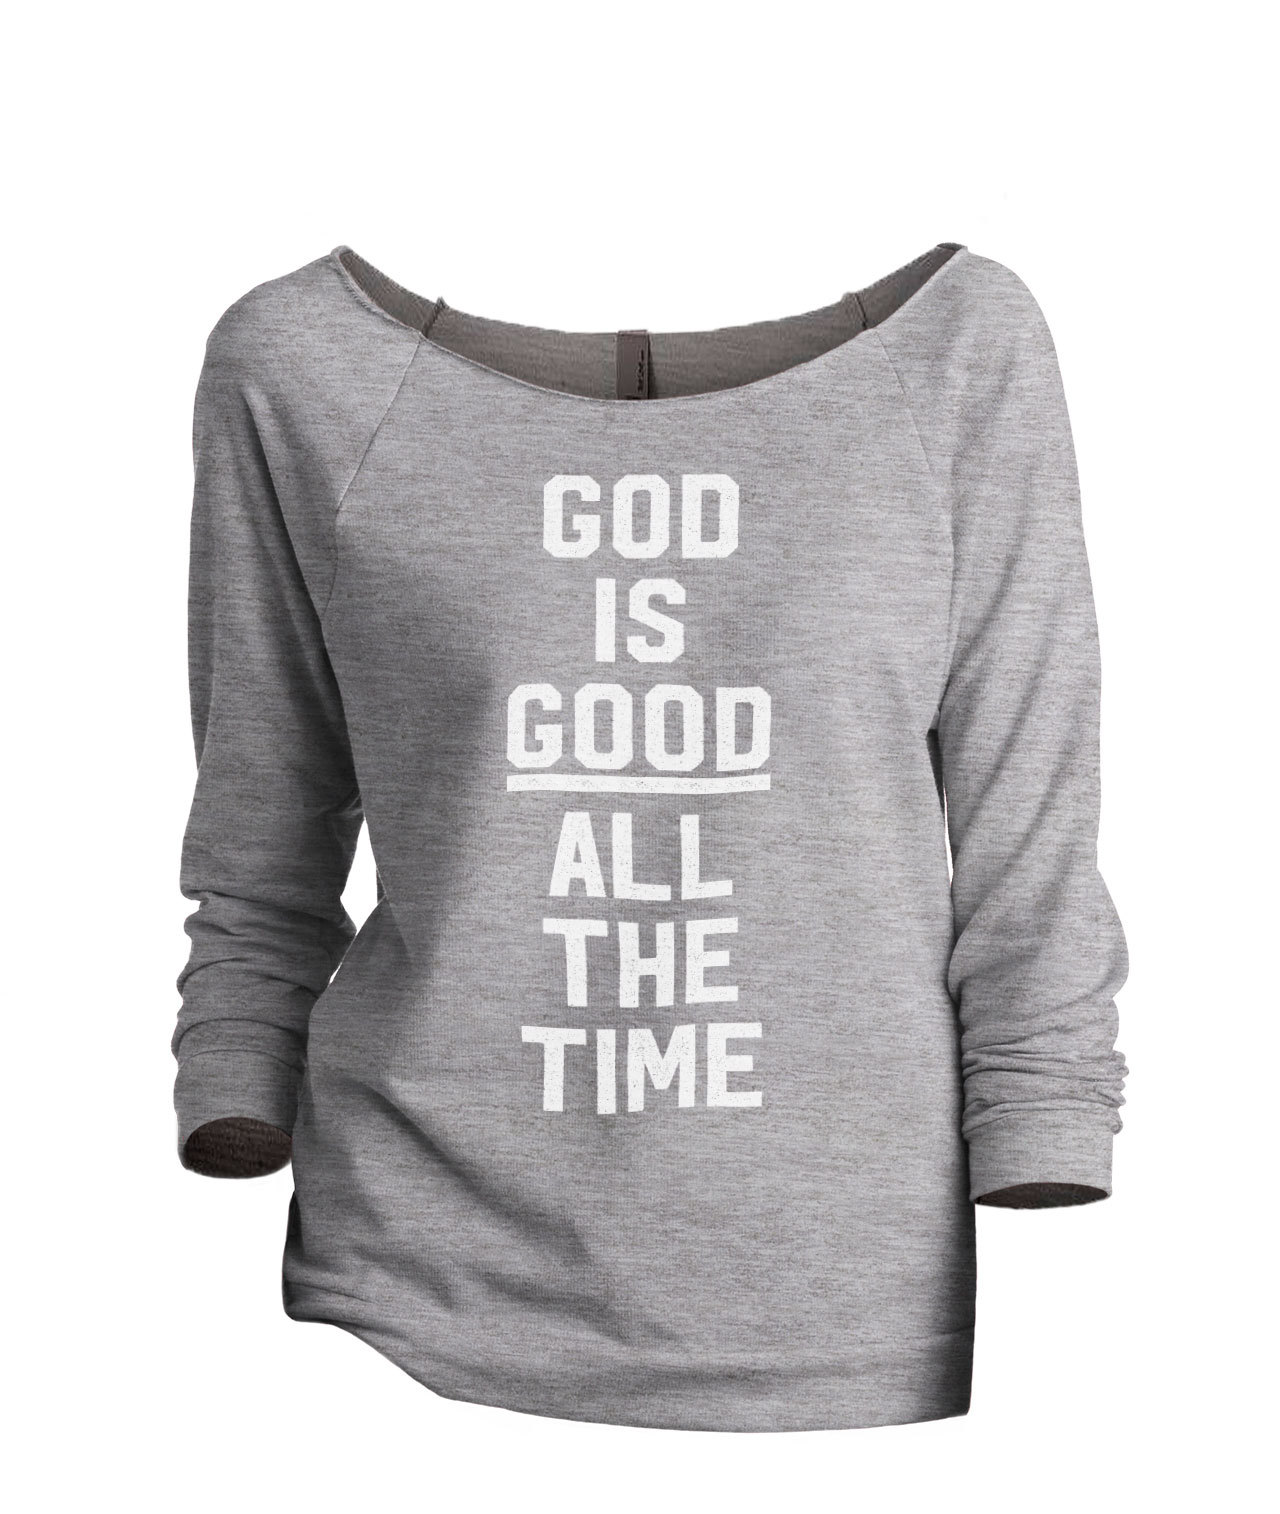 Thread Tank God Is Good Women's Slouchy 3/4 Sleeves Raglan Sweatshirt Sport Grey - $24.99 - $25.99